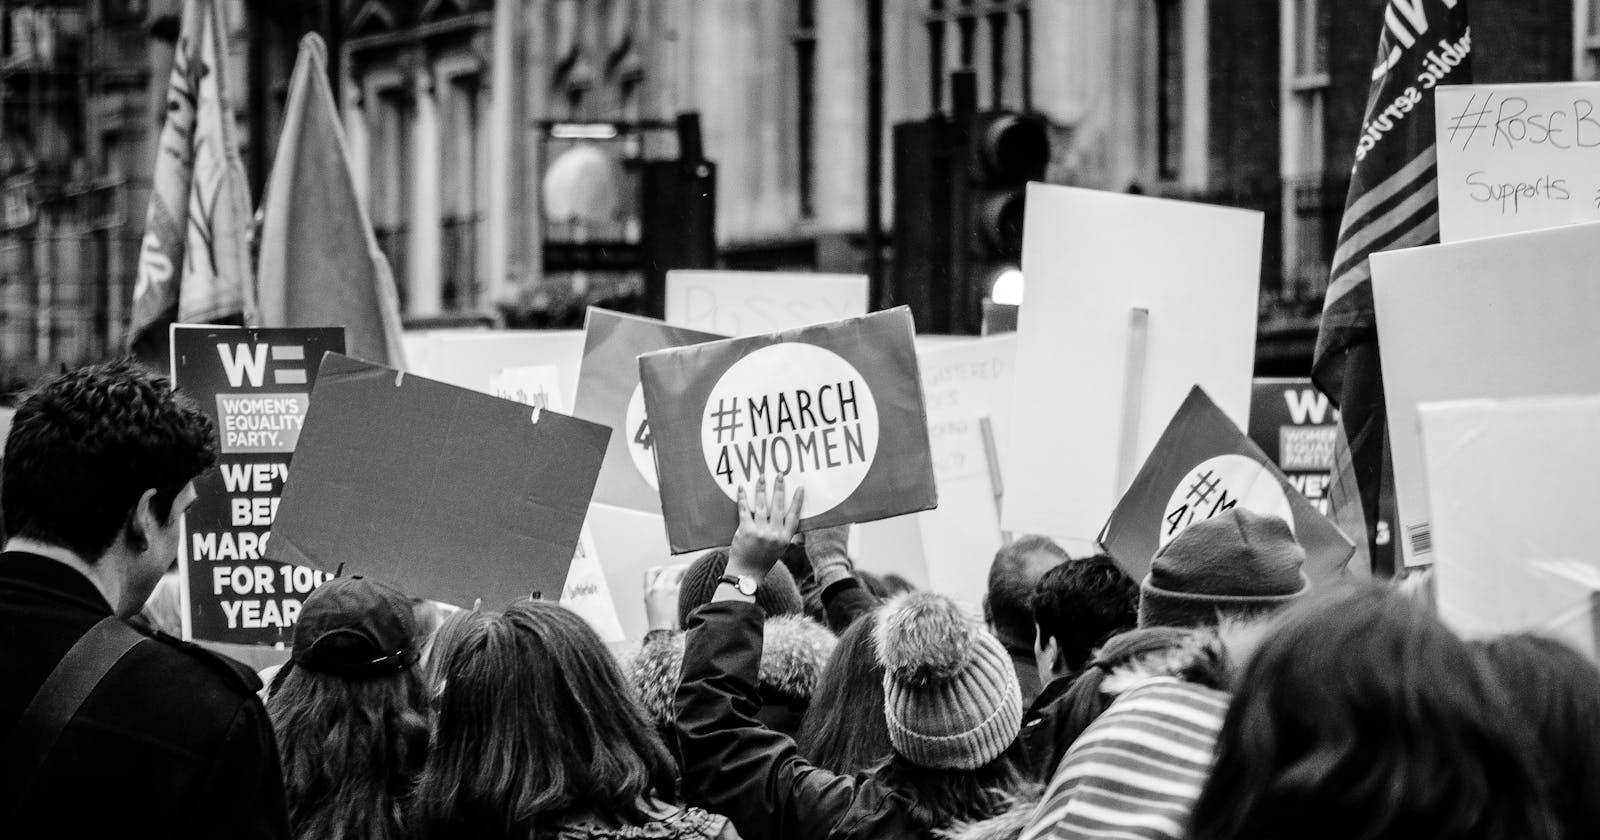 Decision to write about manifestos